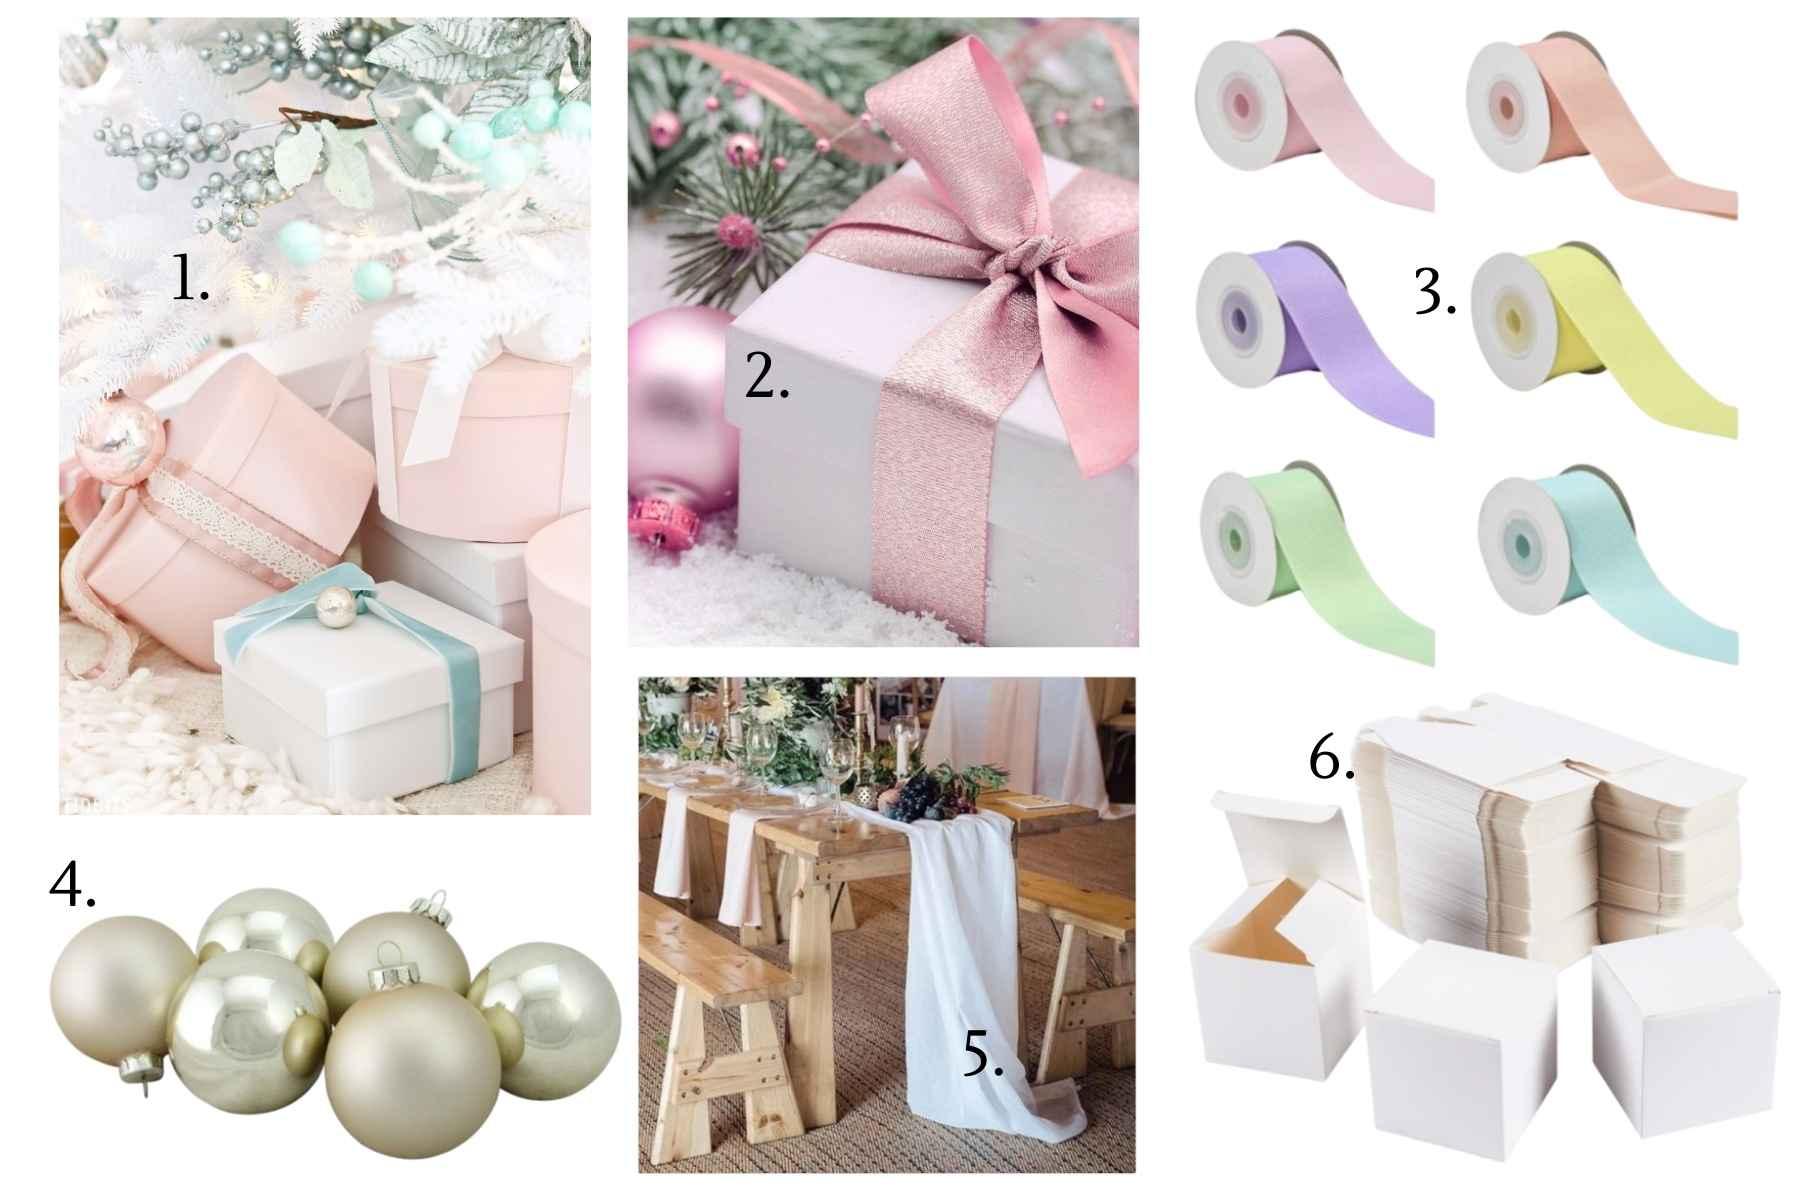 DIY Christmas Wedding Centerpiece - 3